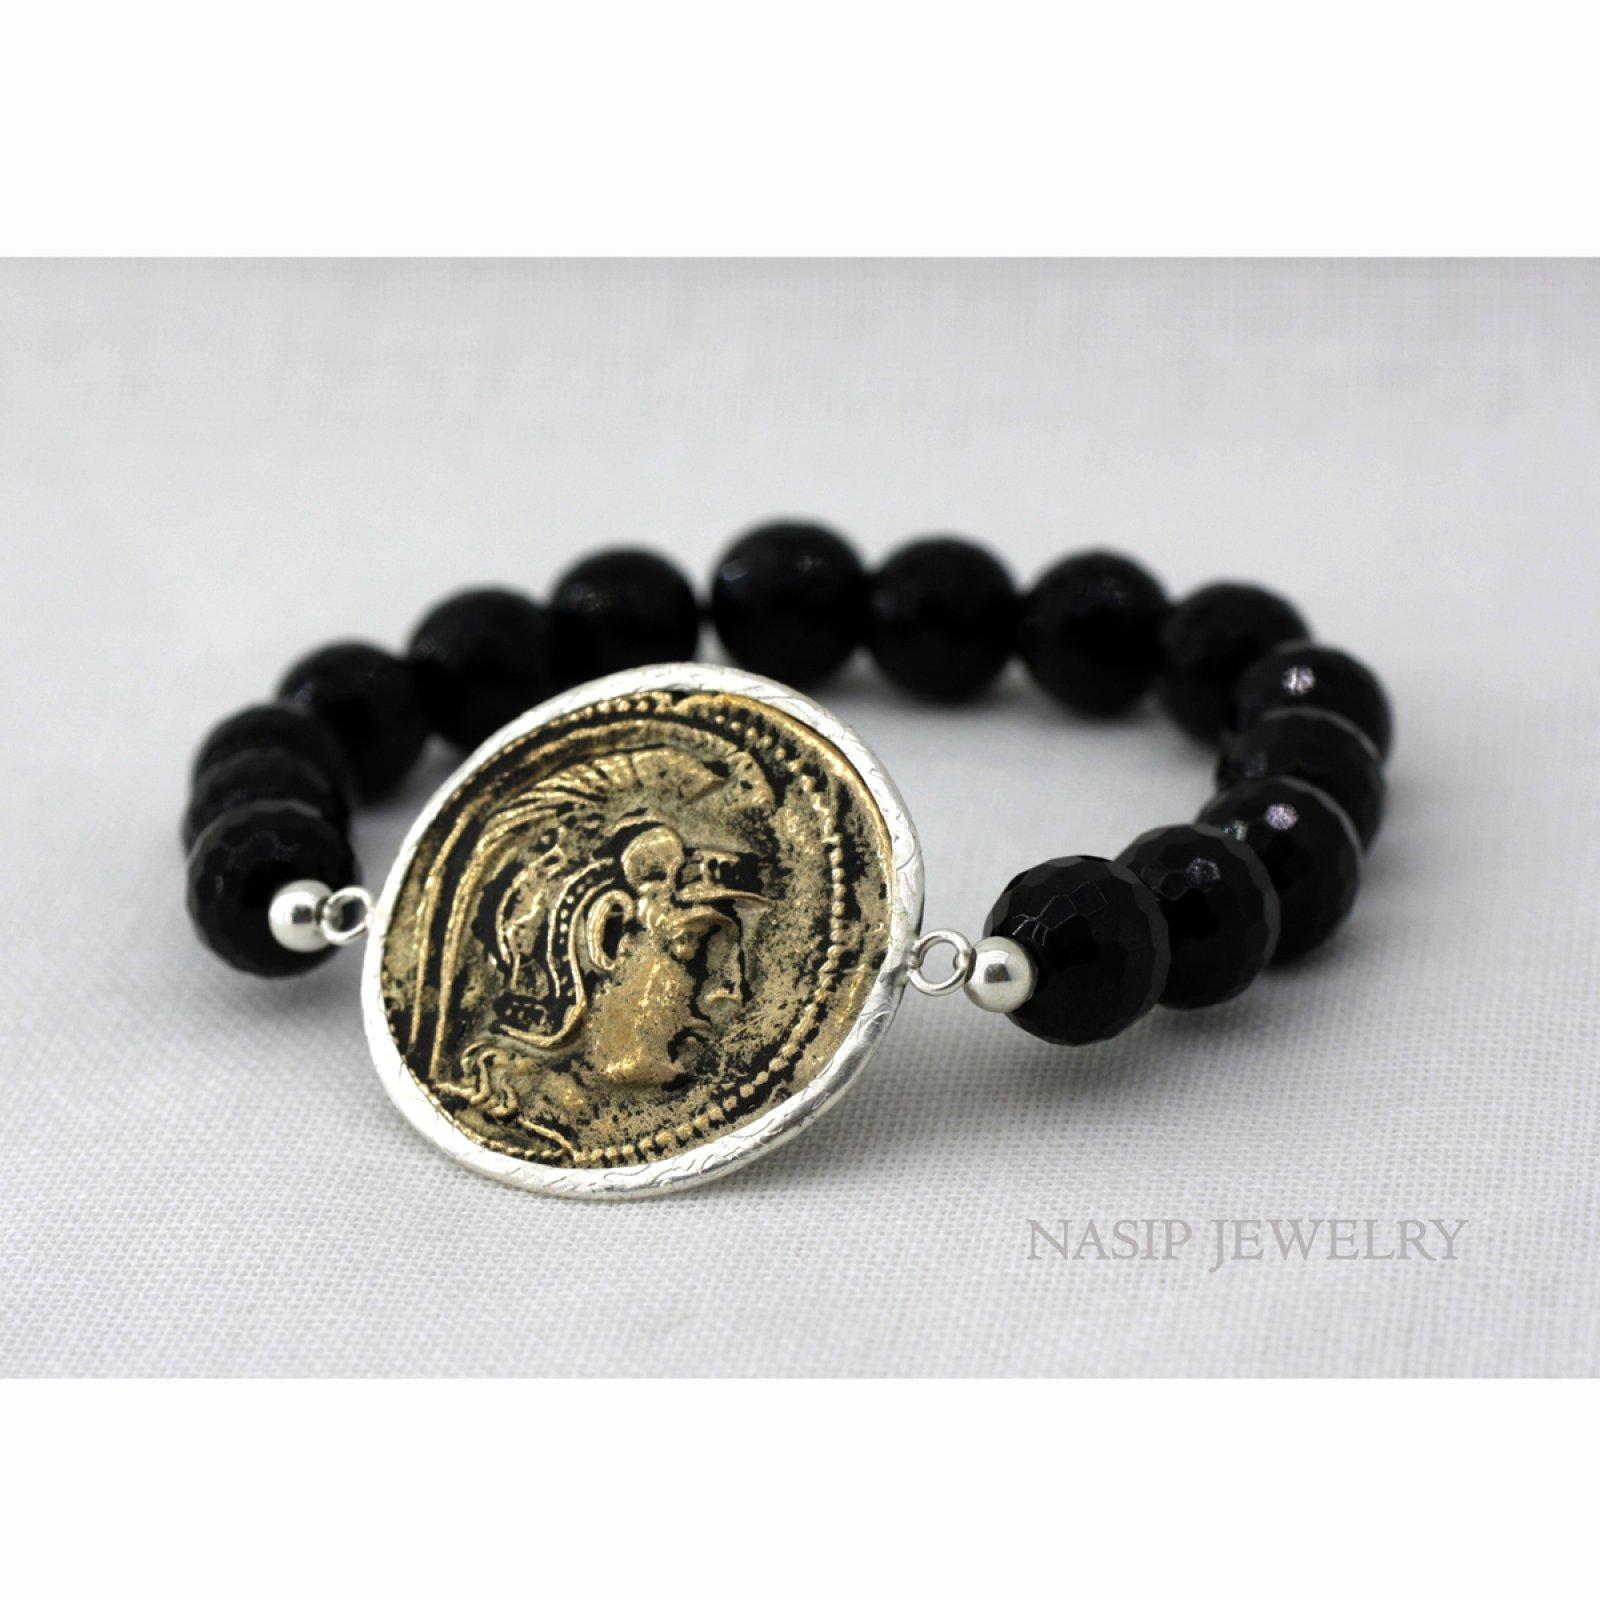 ONYX STONE BEADS, BRONZE ROMAN COIN 925 SILVER BRACELET